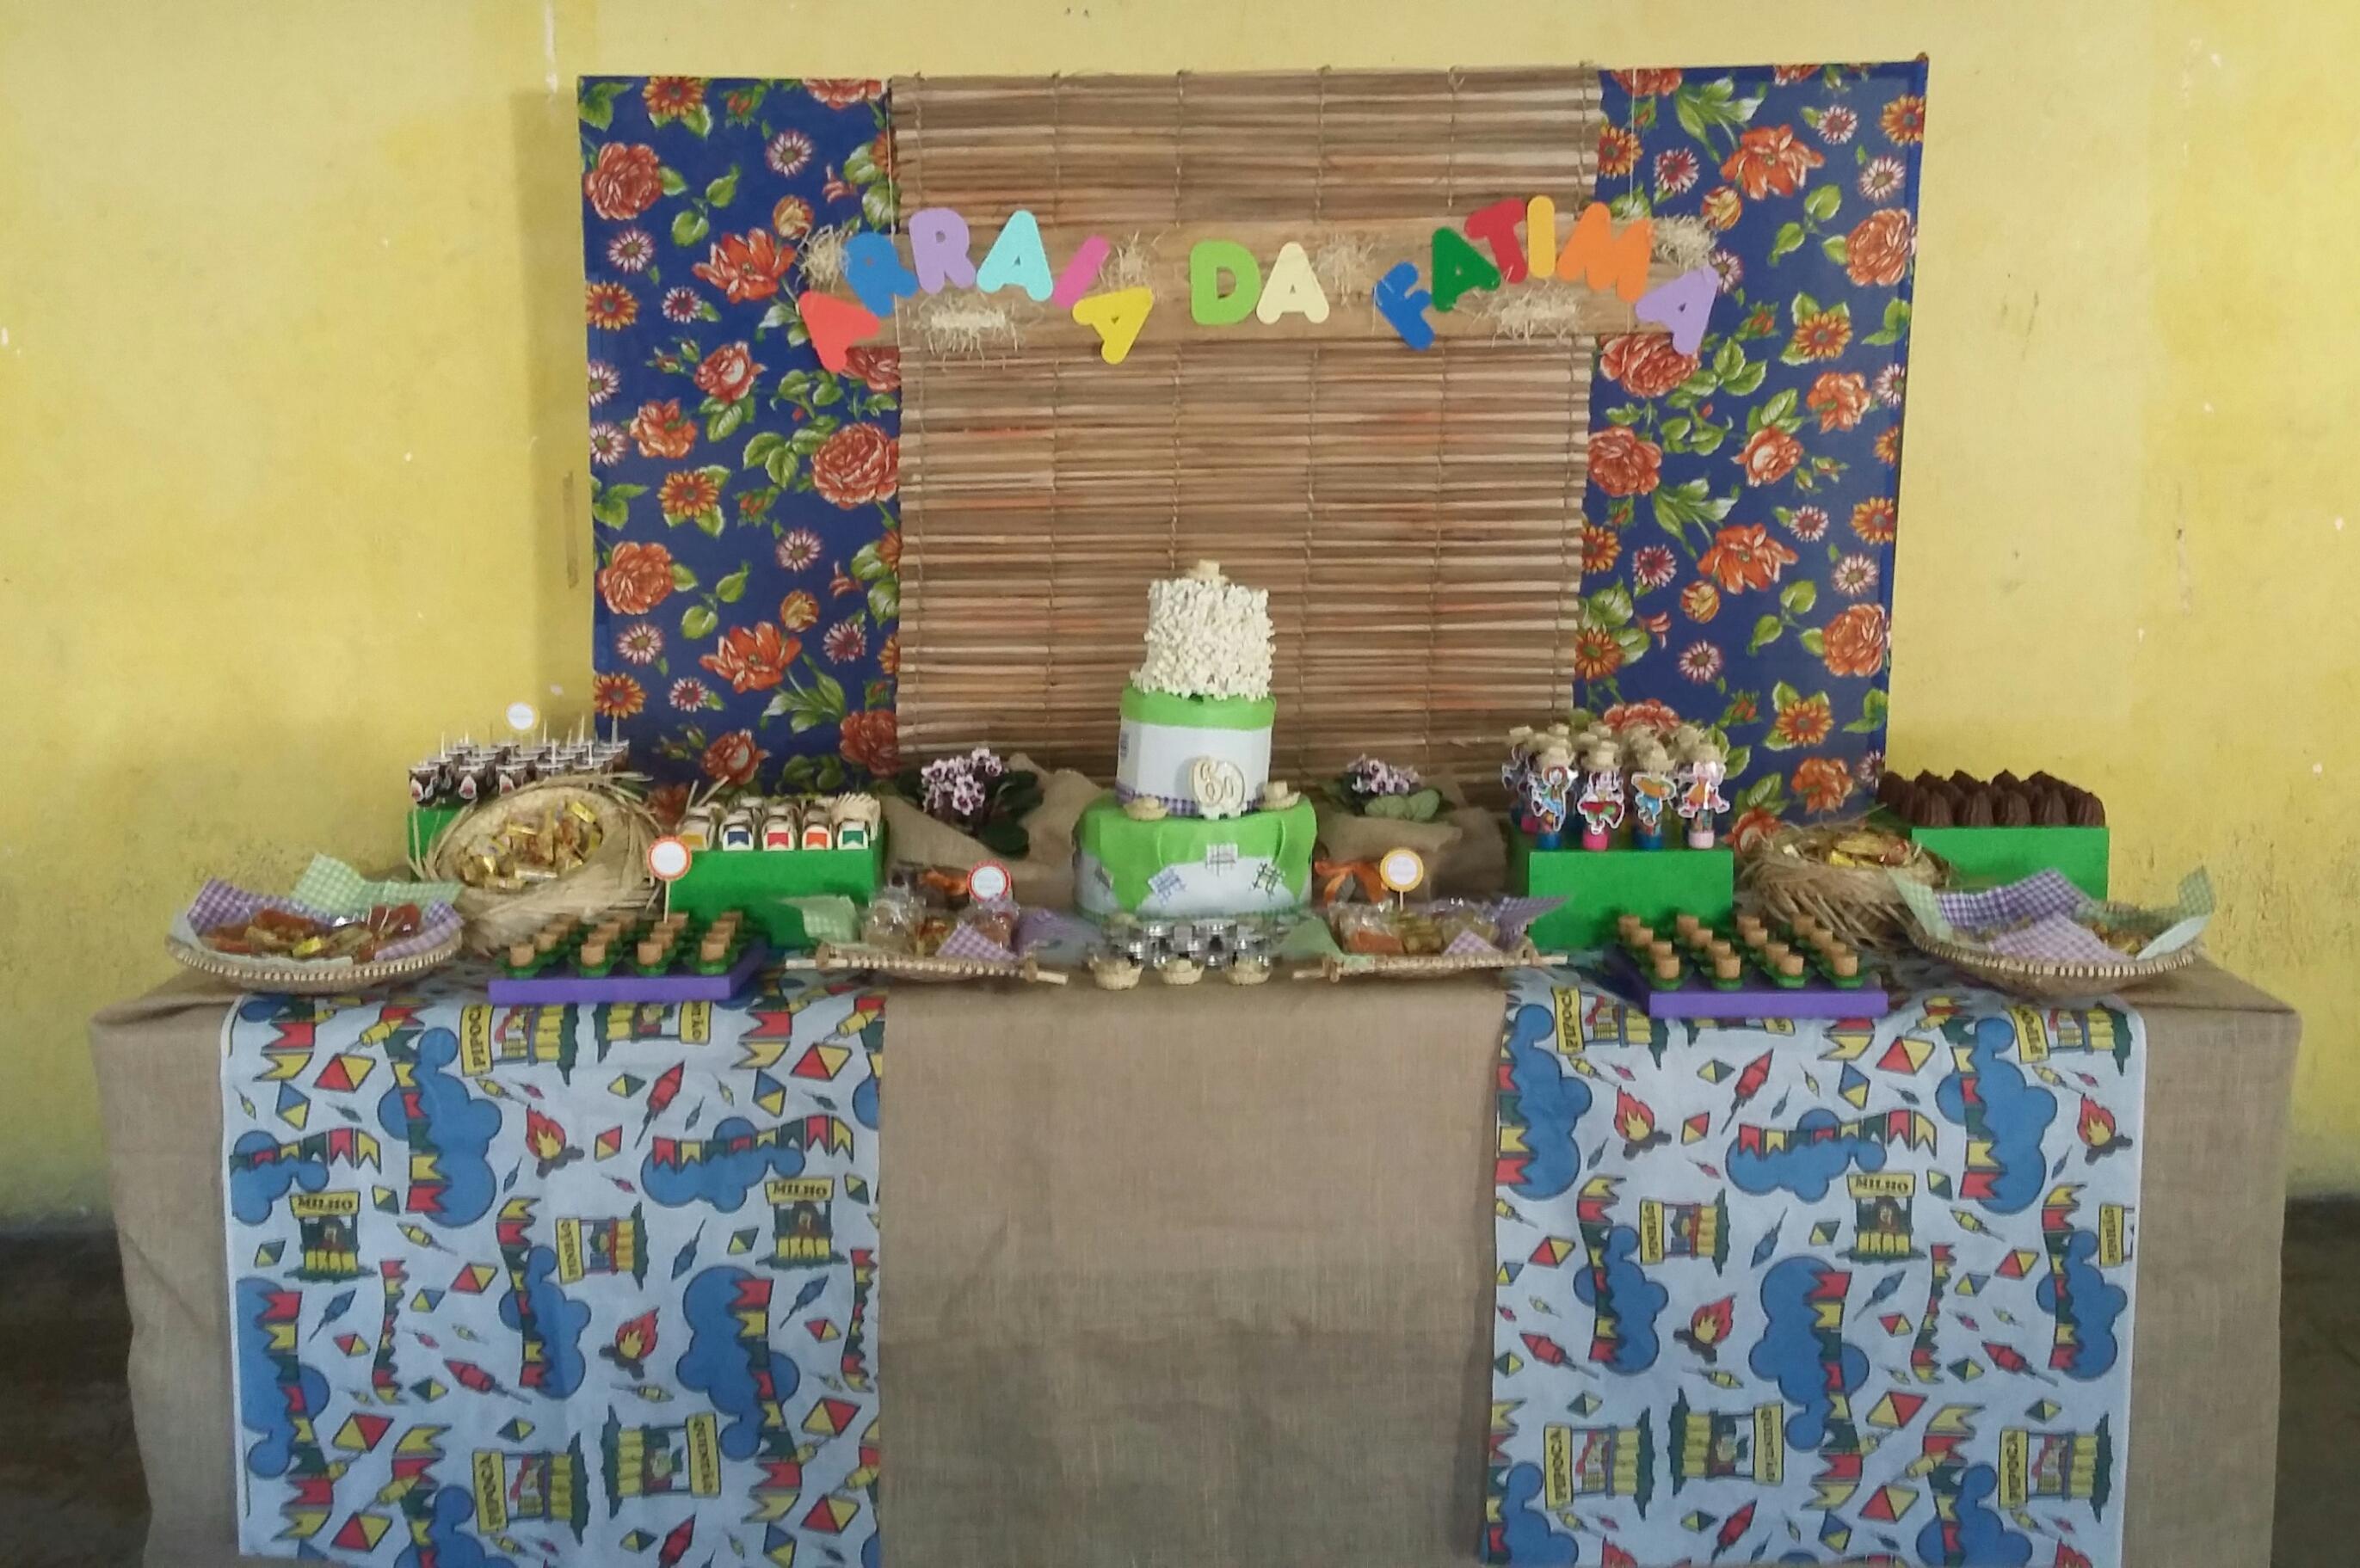 decoracao festa caipira:decoracao-festa-na-roca-decoracao-festa-caipira